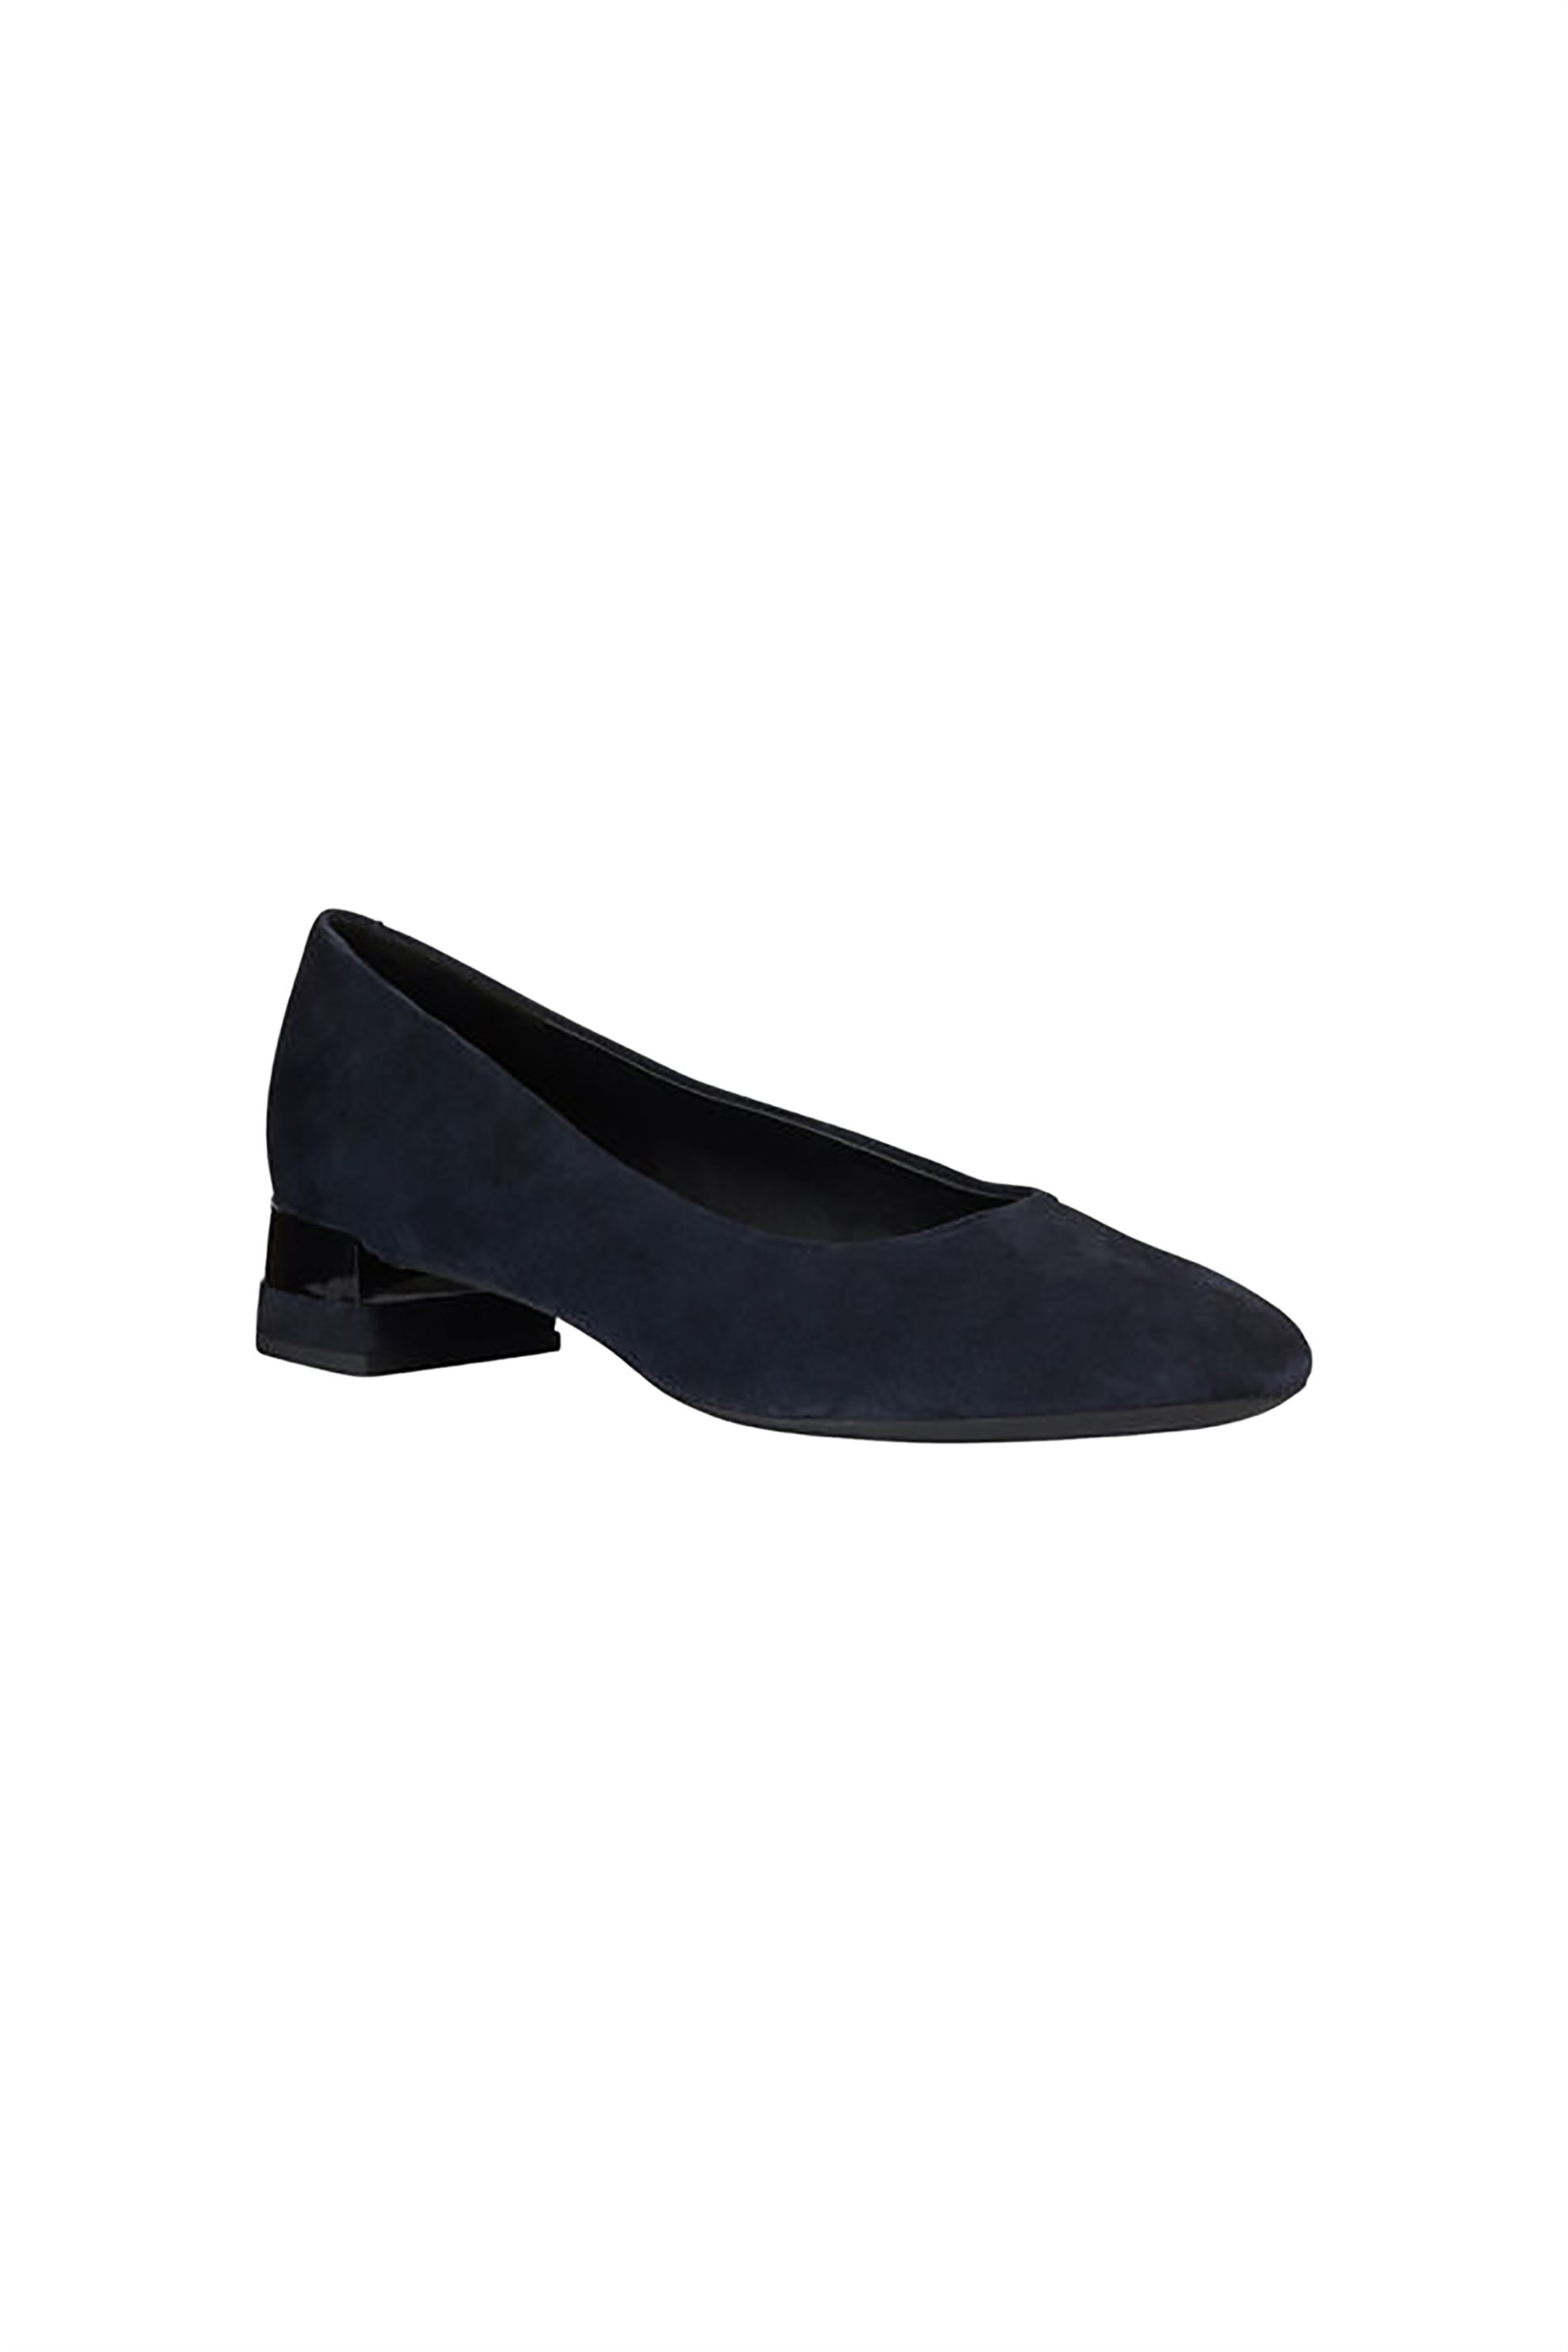 Geox γυναικείες suede γόβες «D CHLOO» – D949XB – Μπλε Σκούρο